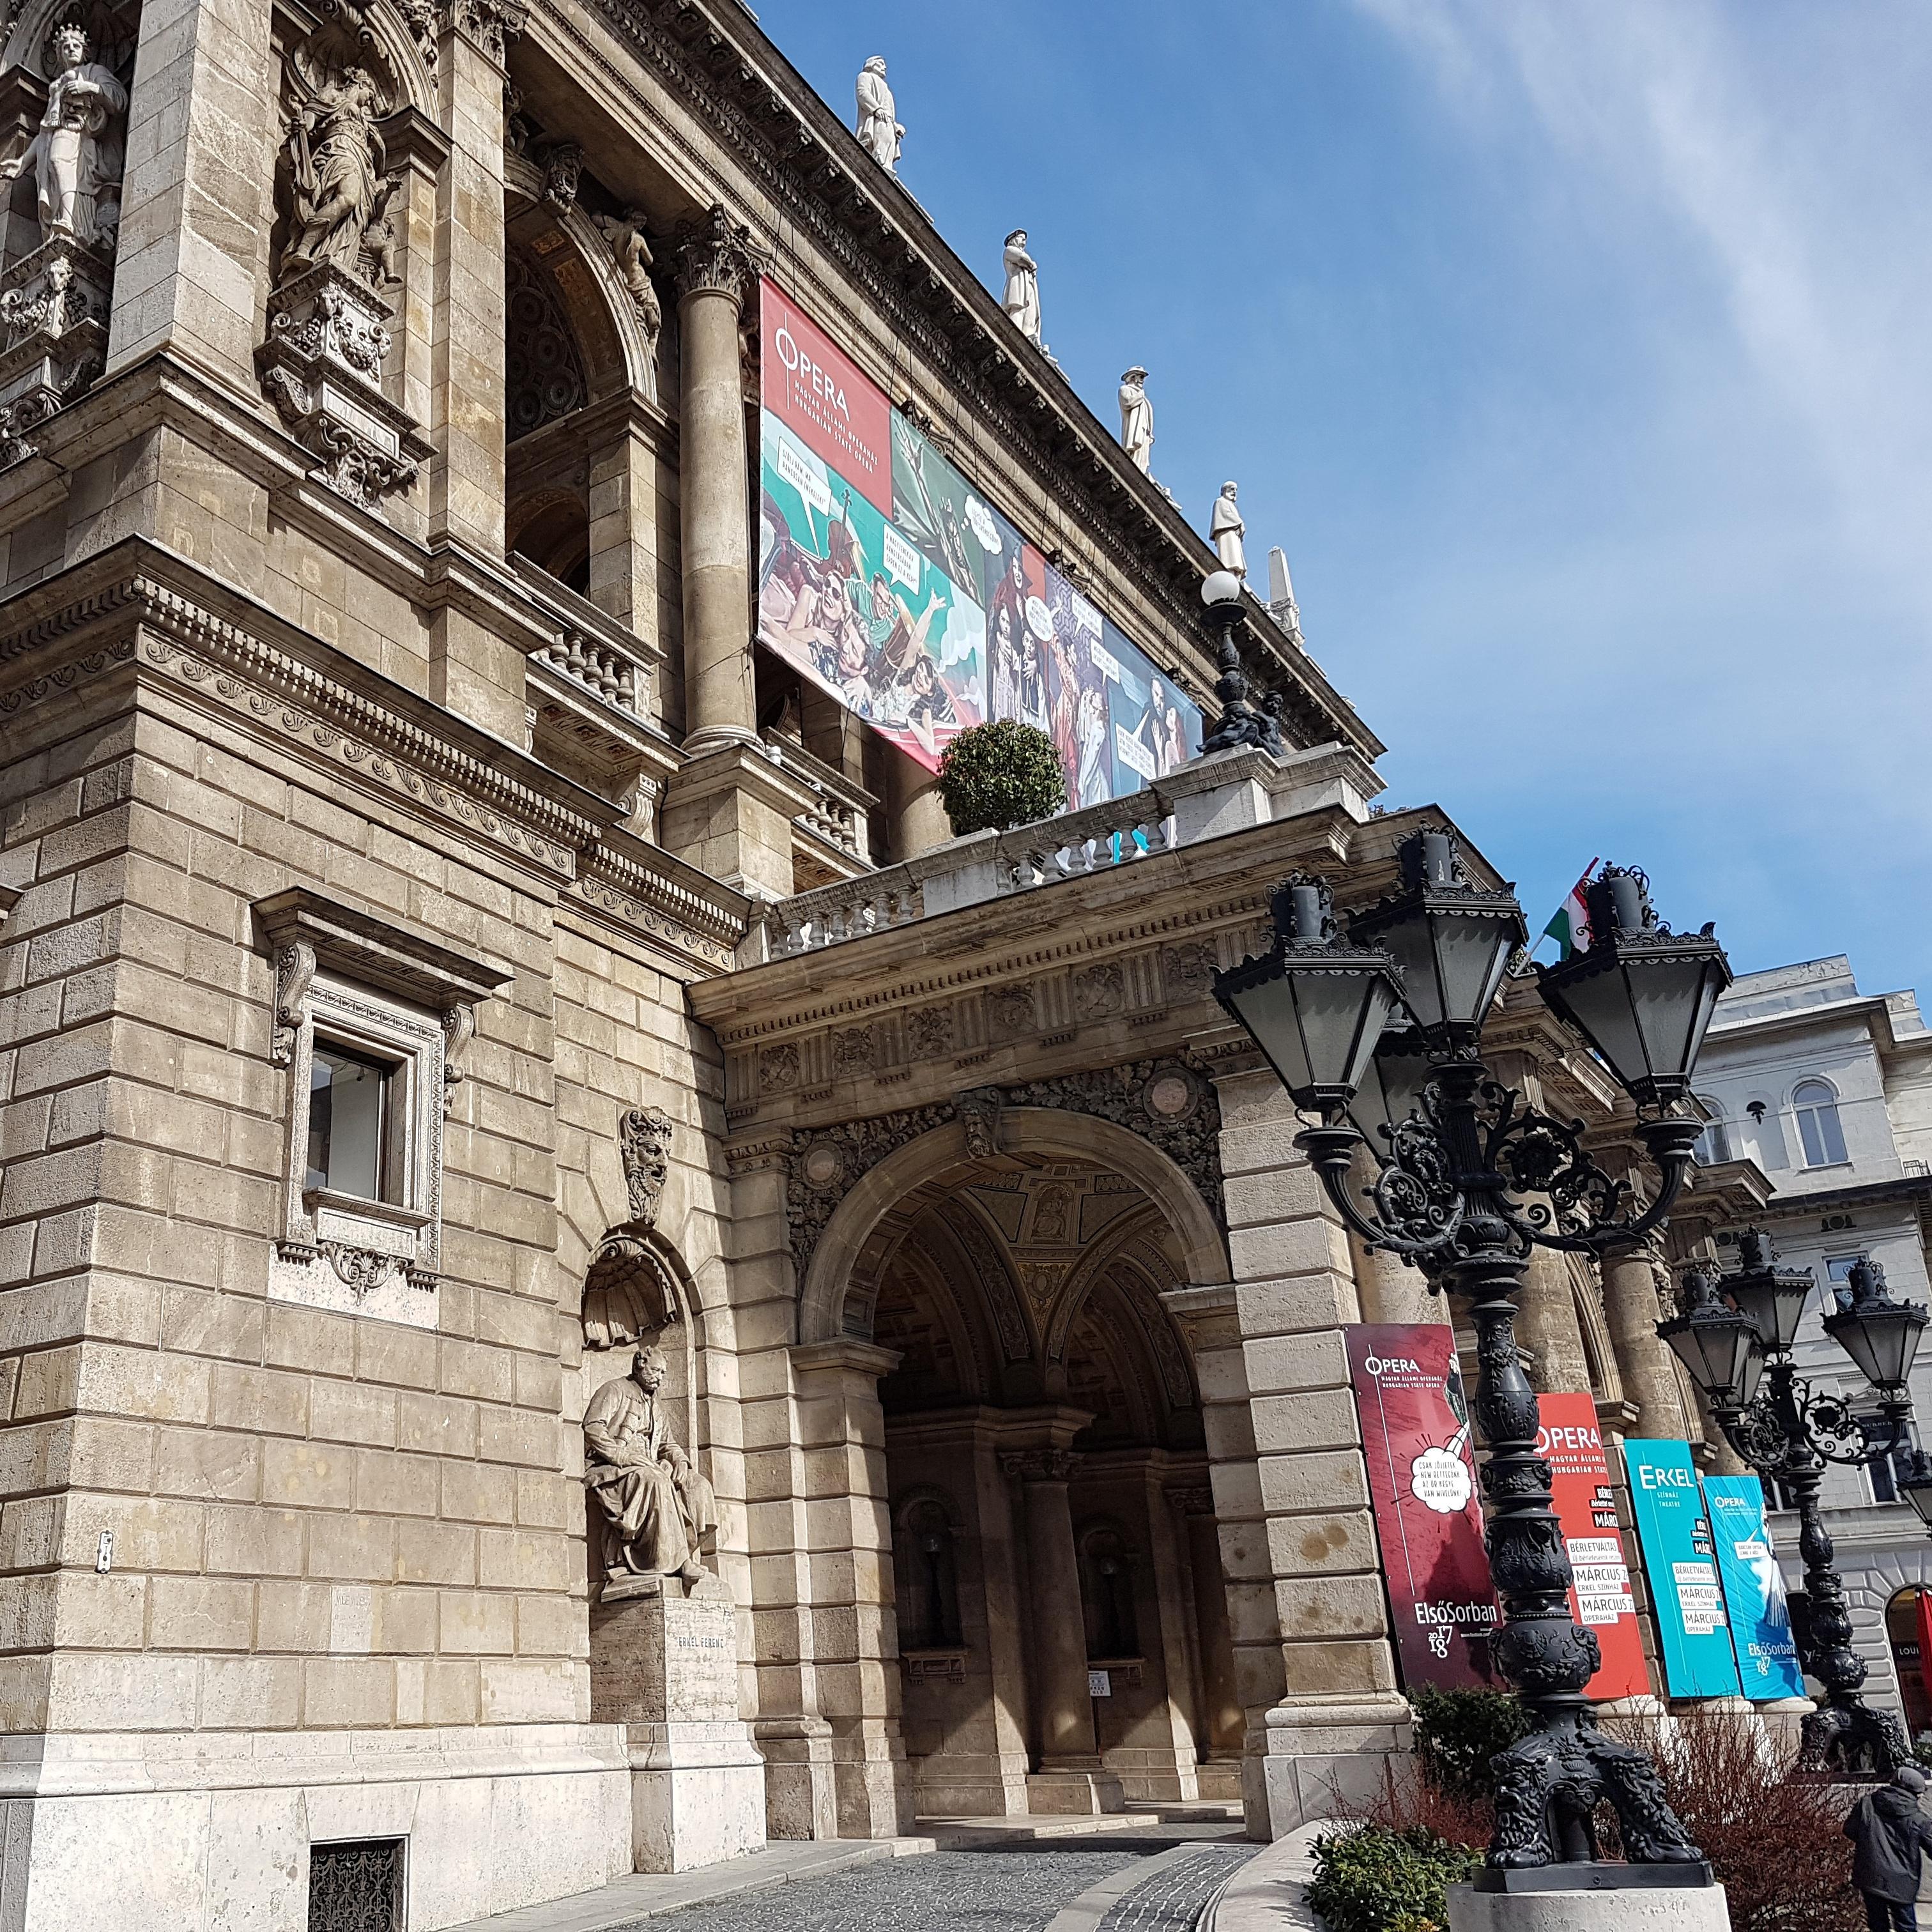 8. Opera house